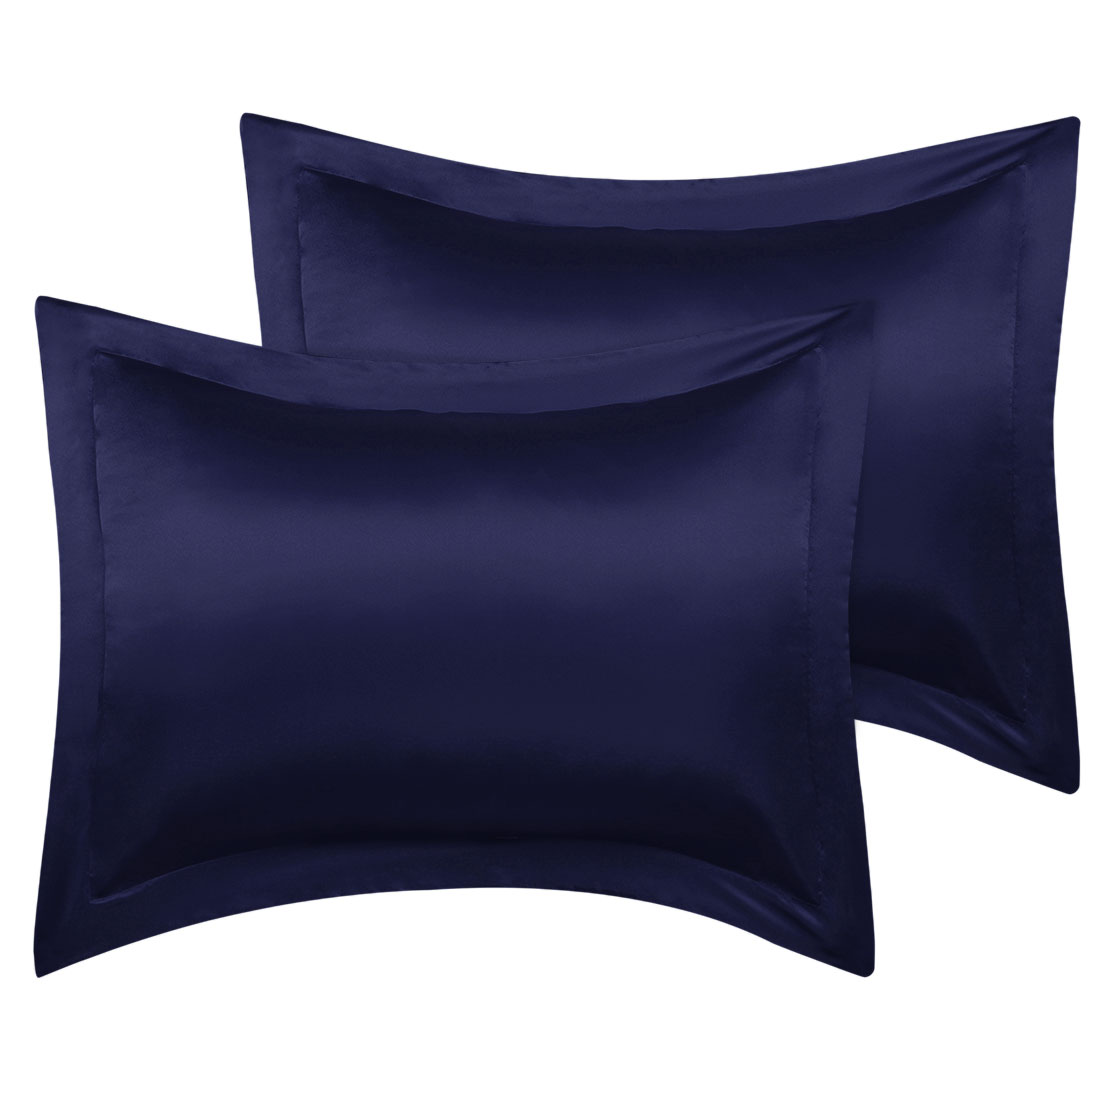 2 Pcs Navy Pillow Shams Satin Pillow Cases Standard Oxford Pillowcases